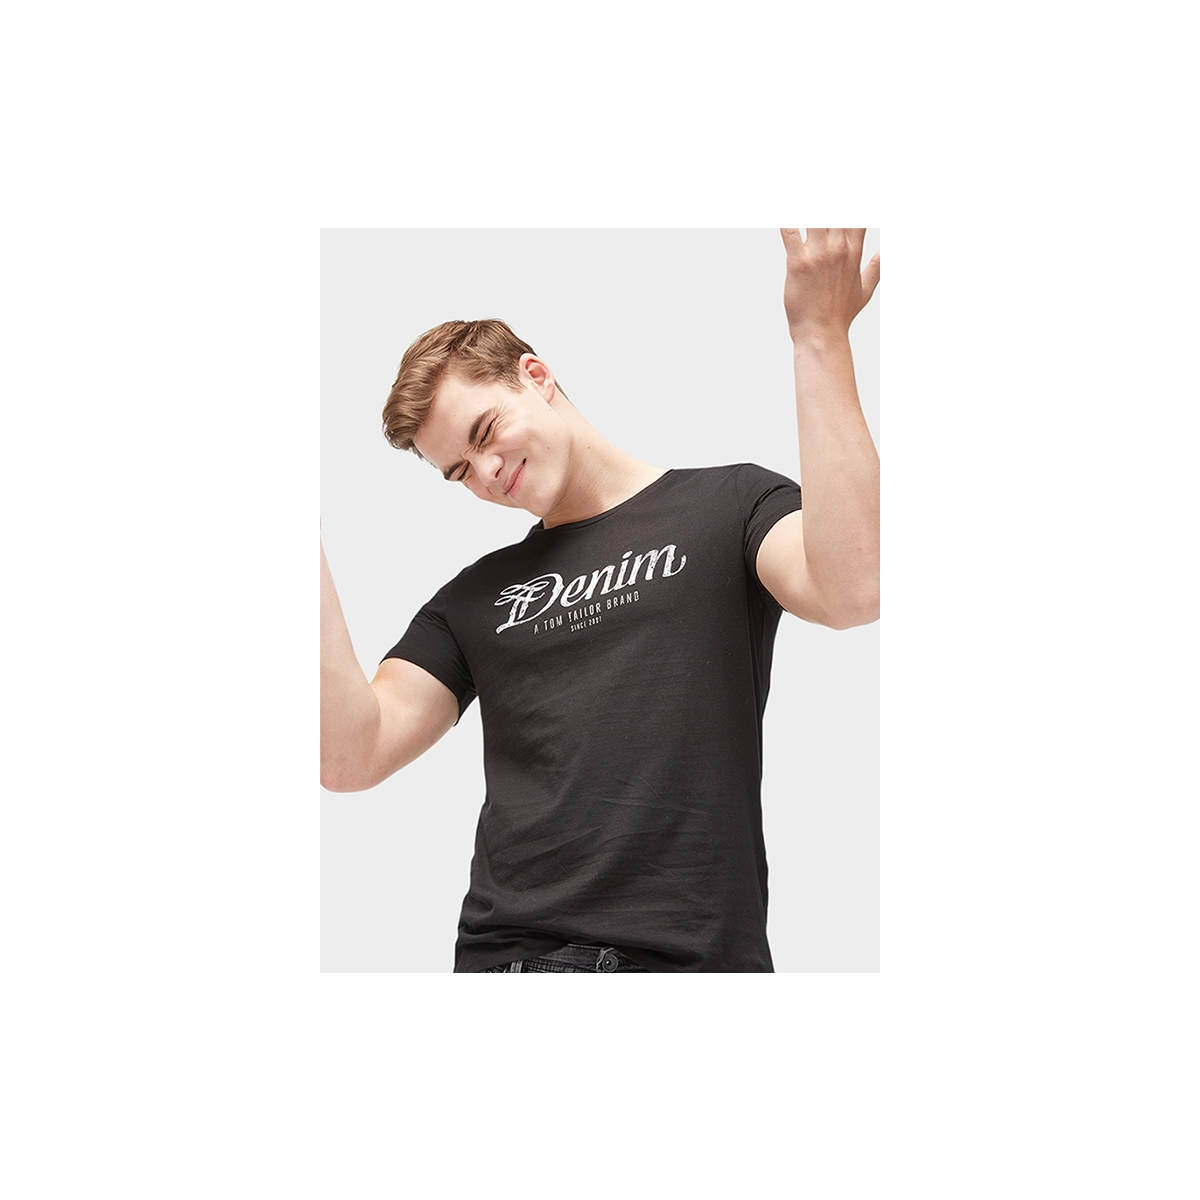 1055467.09.12 tom tailor t-shirt 2999